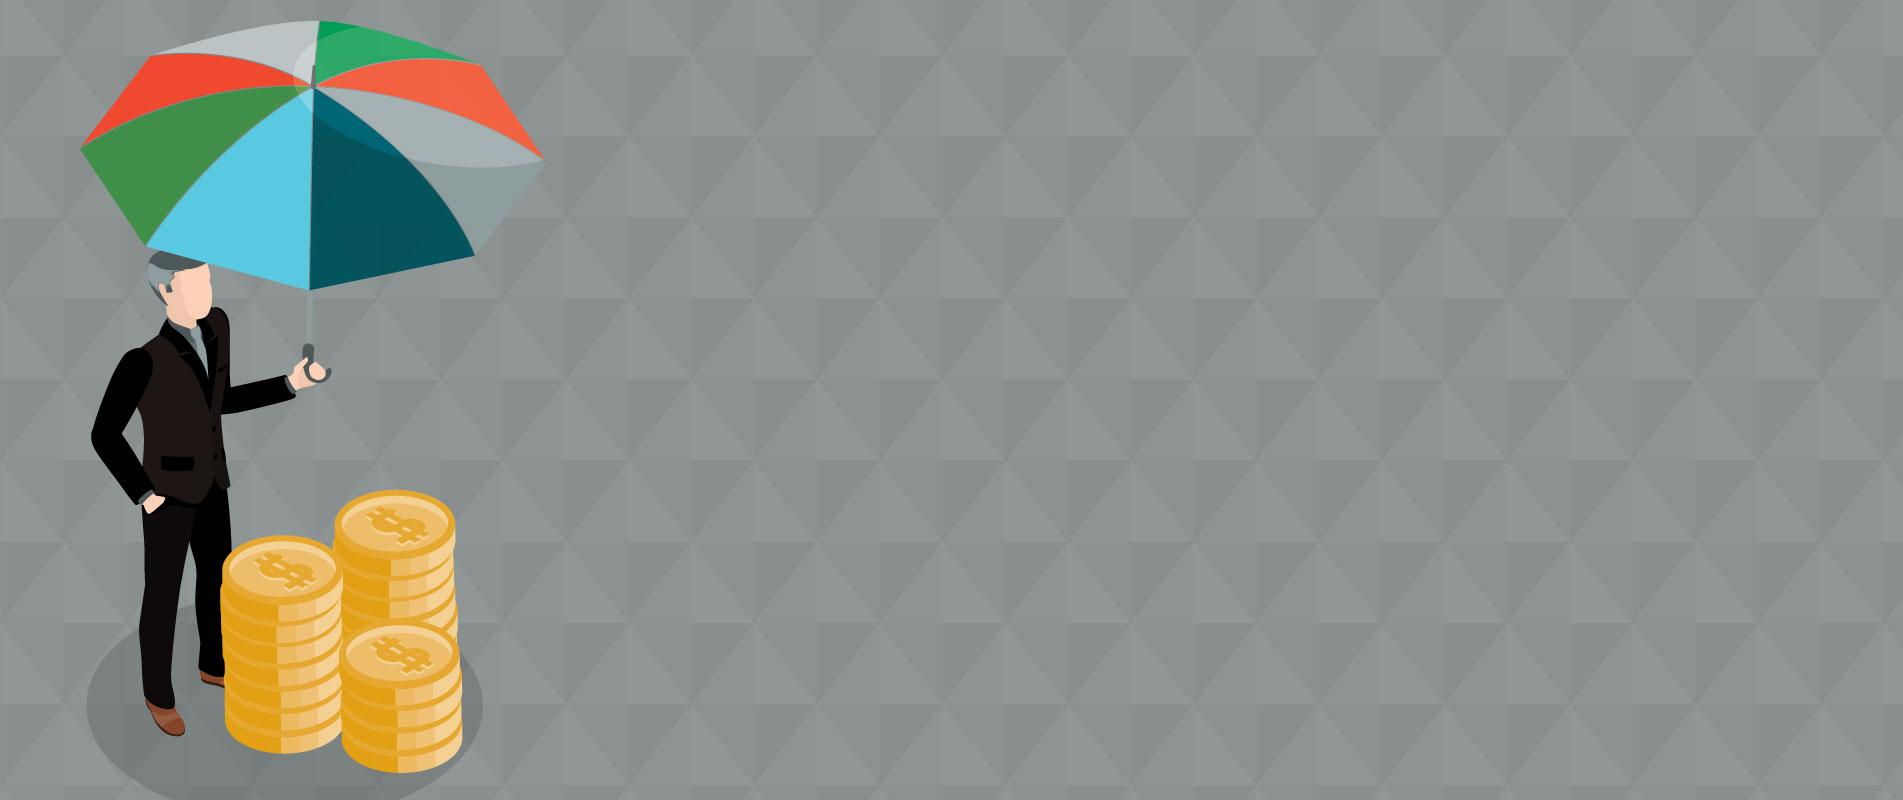 7614_WEB_Covisum_landing-page-graphics-HERO_II.jpg